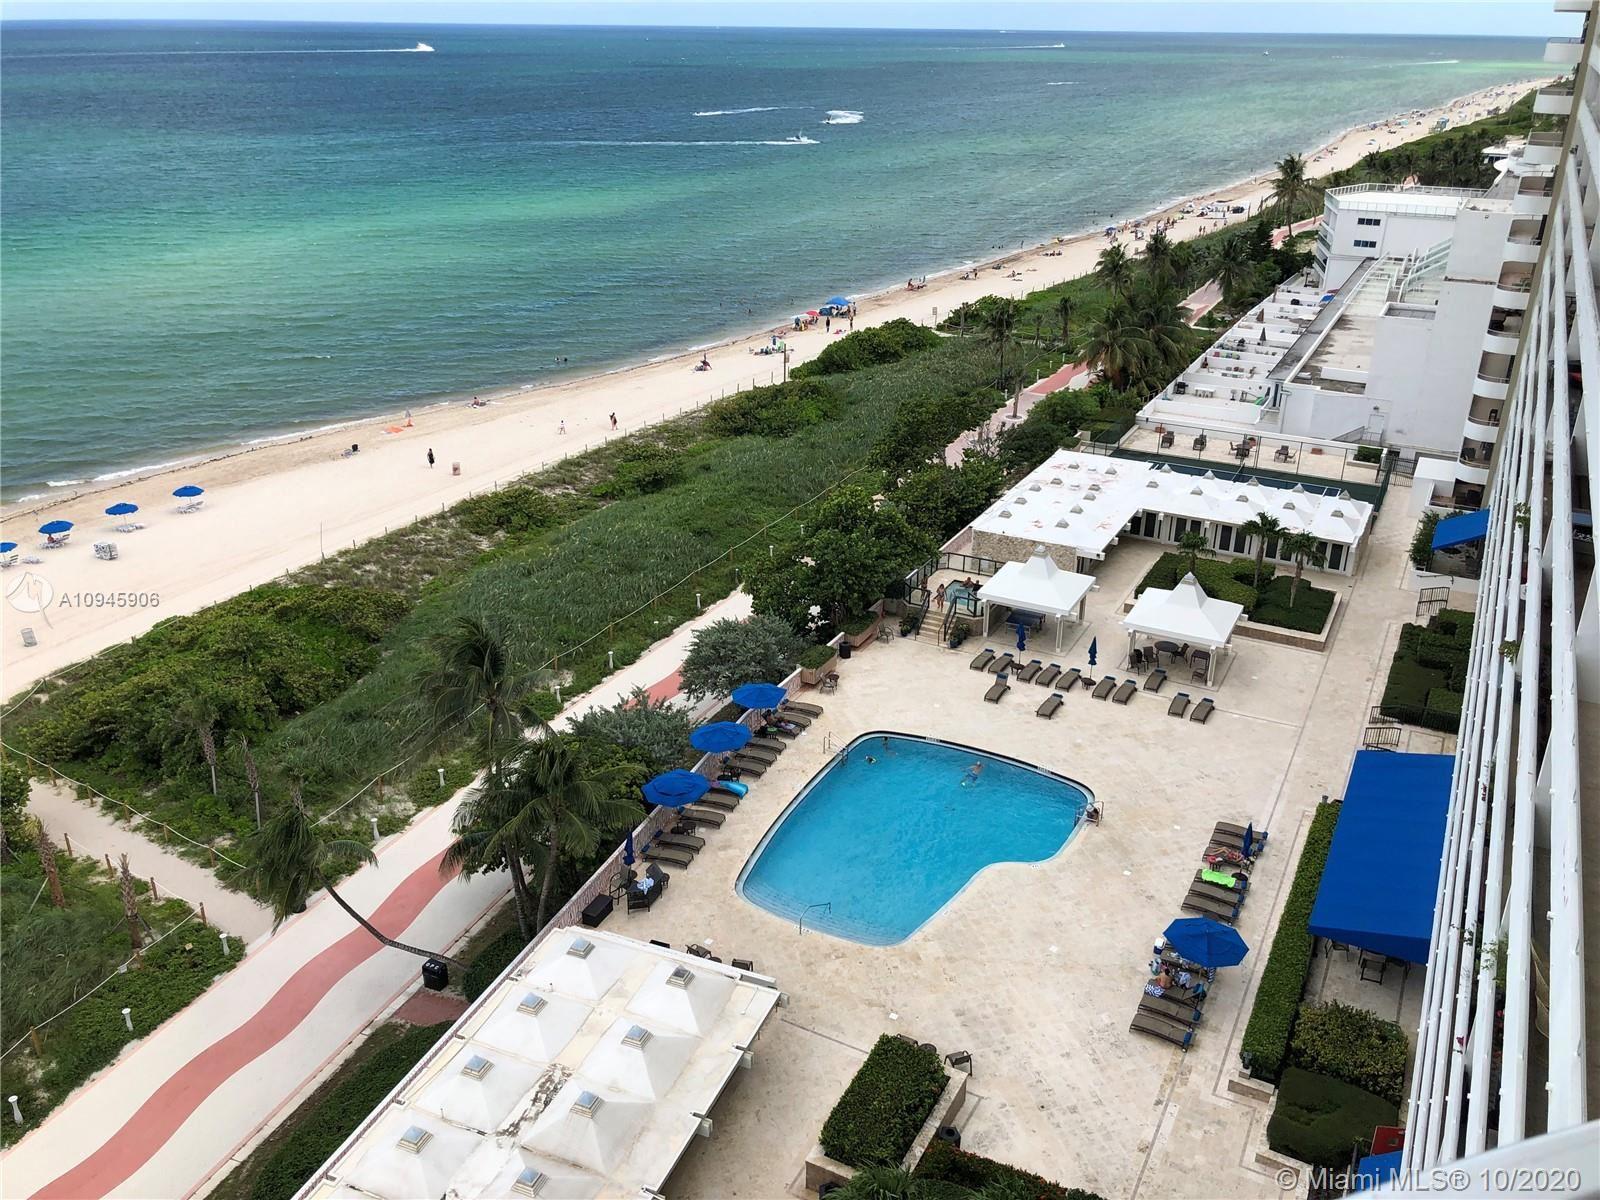 5555 Collins Ave #14D, Miami Beach, FL 33140 - #: A10945906